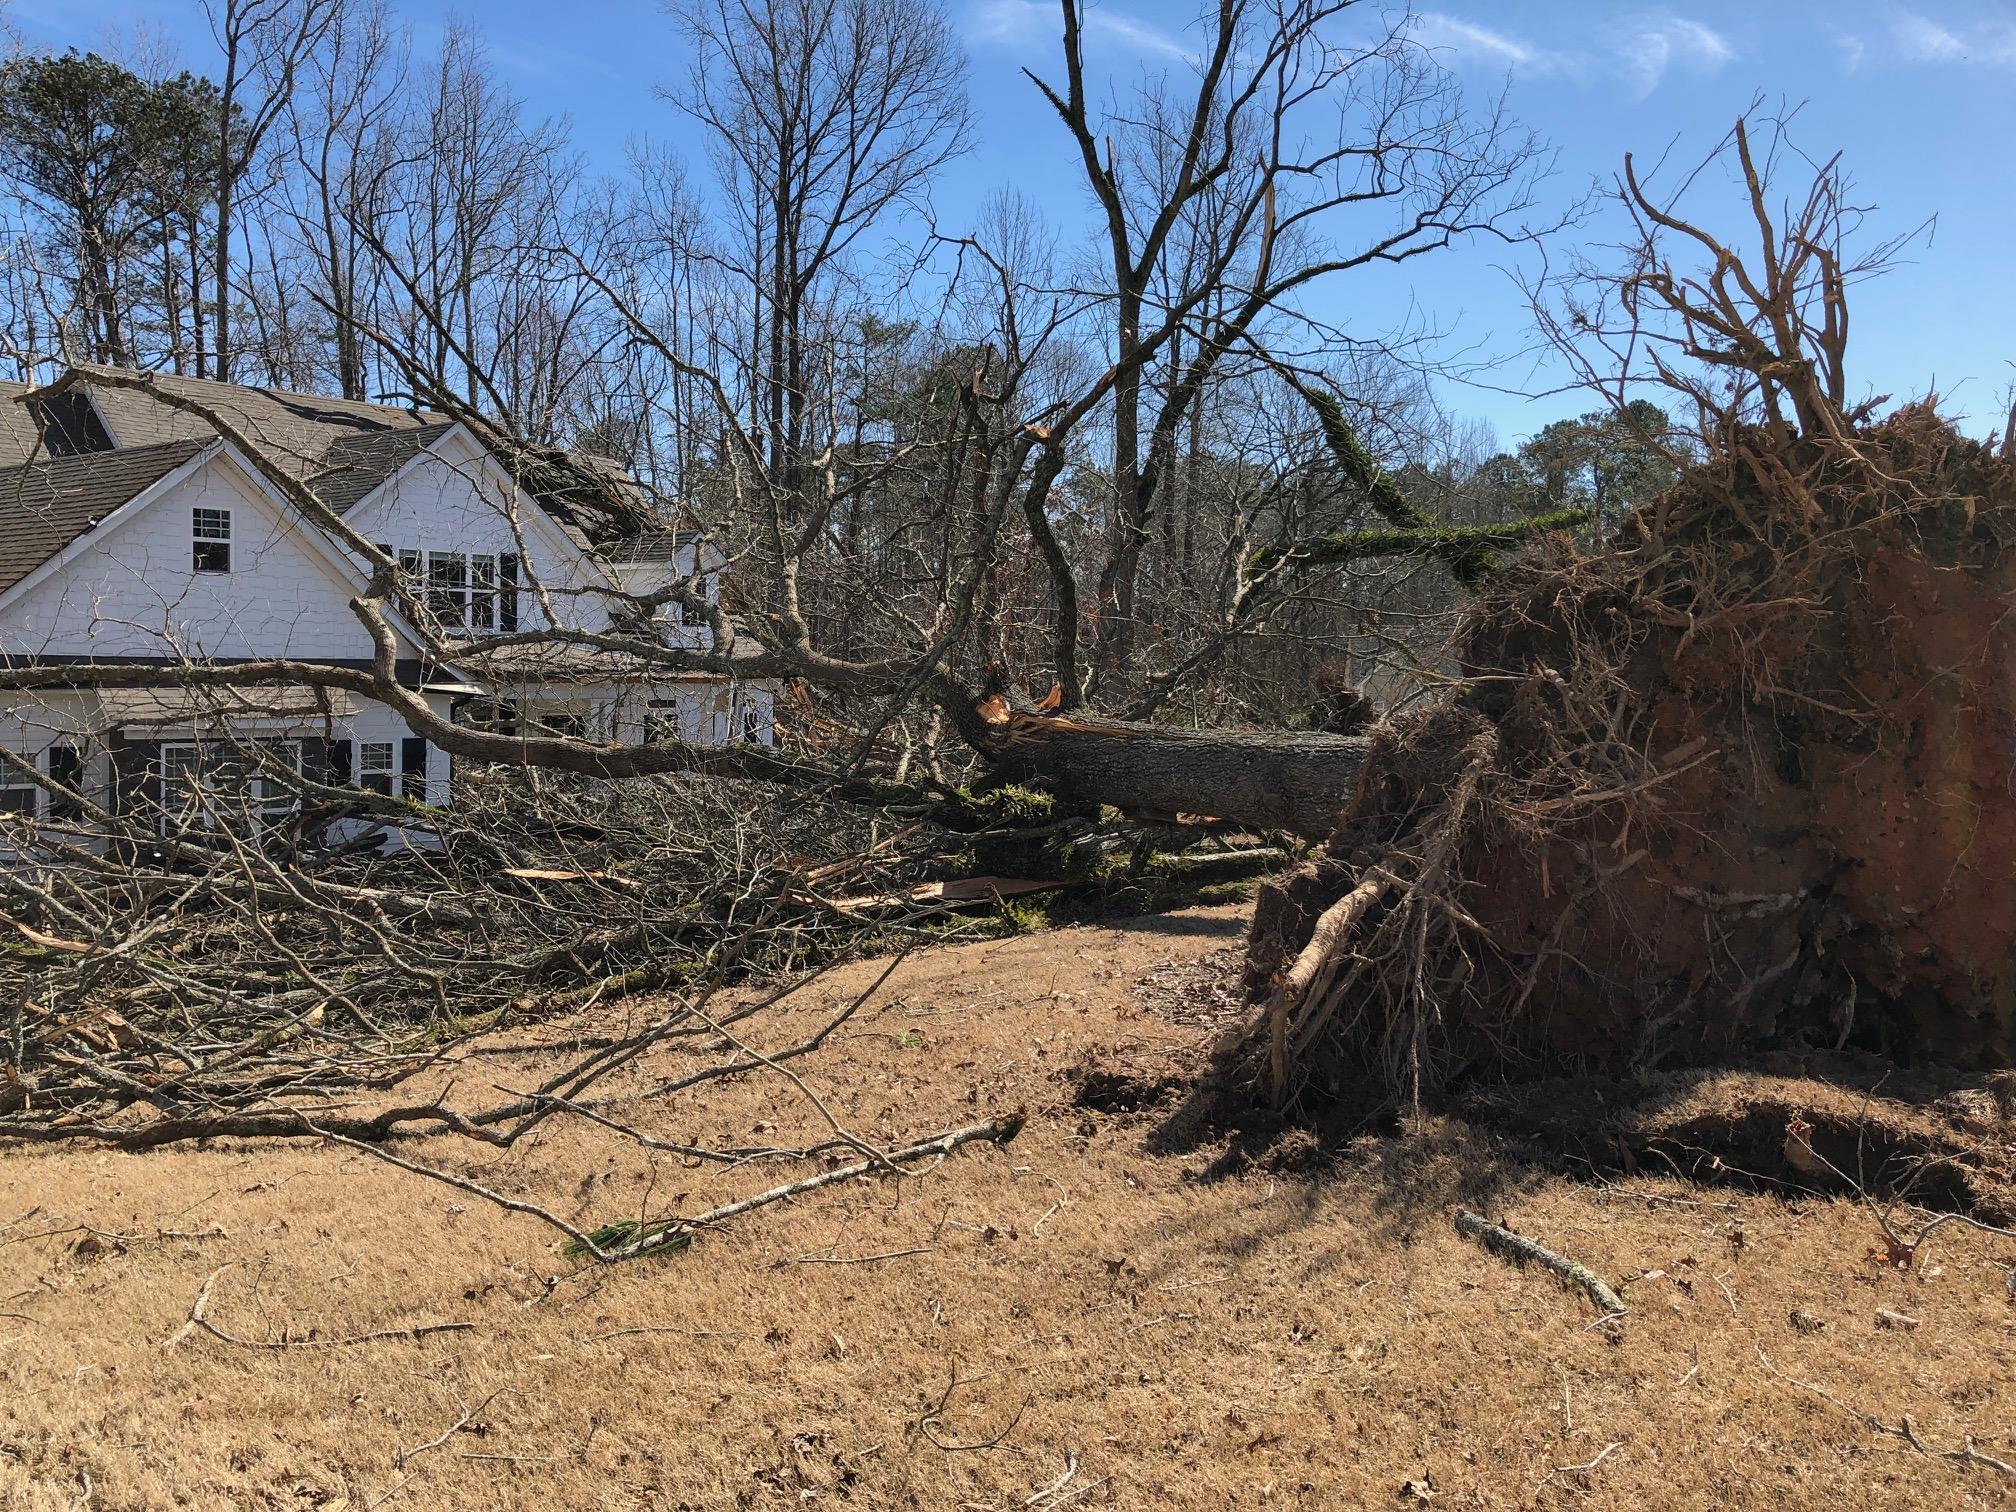 February 24th, 2019 Coweta County EF-1 Tornado